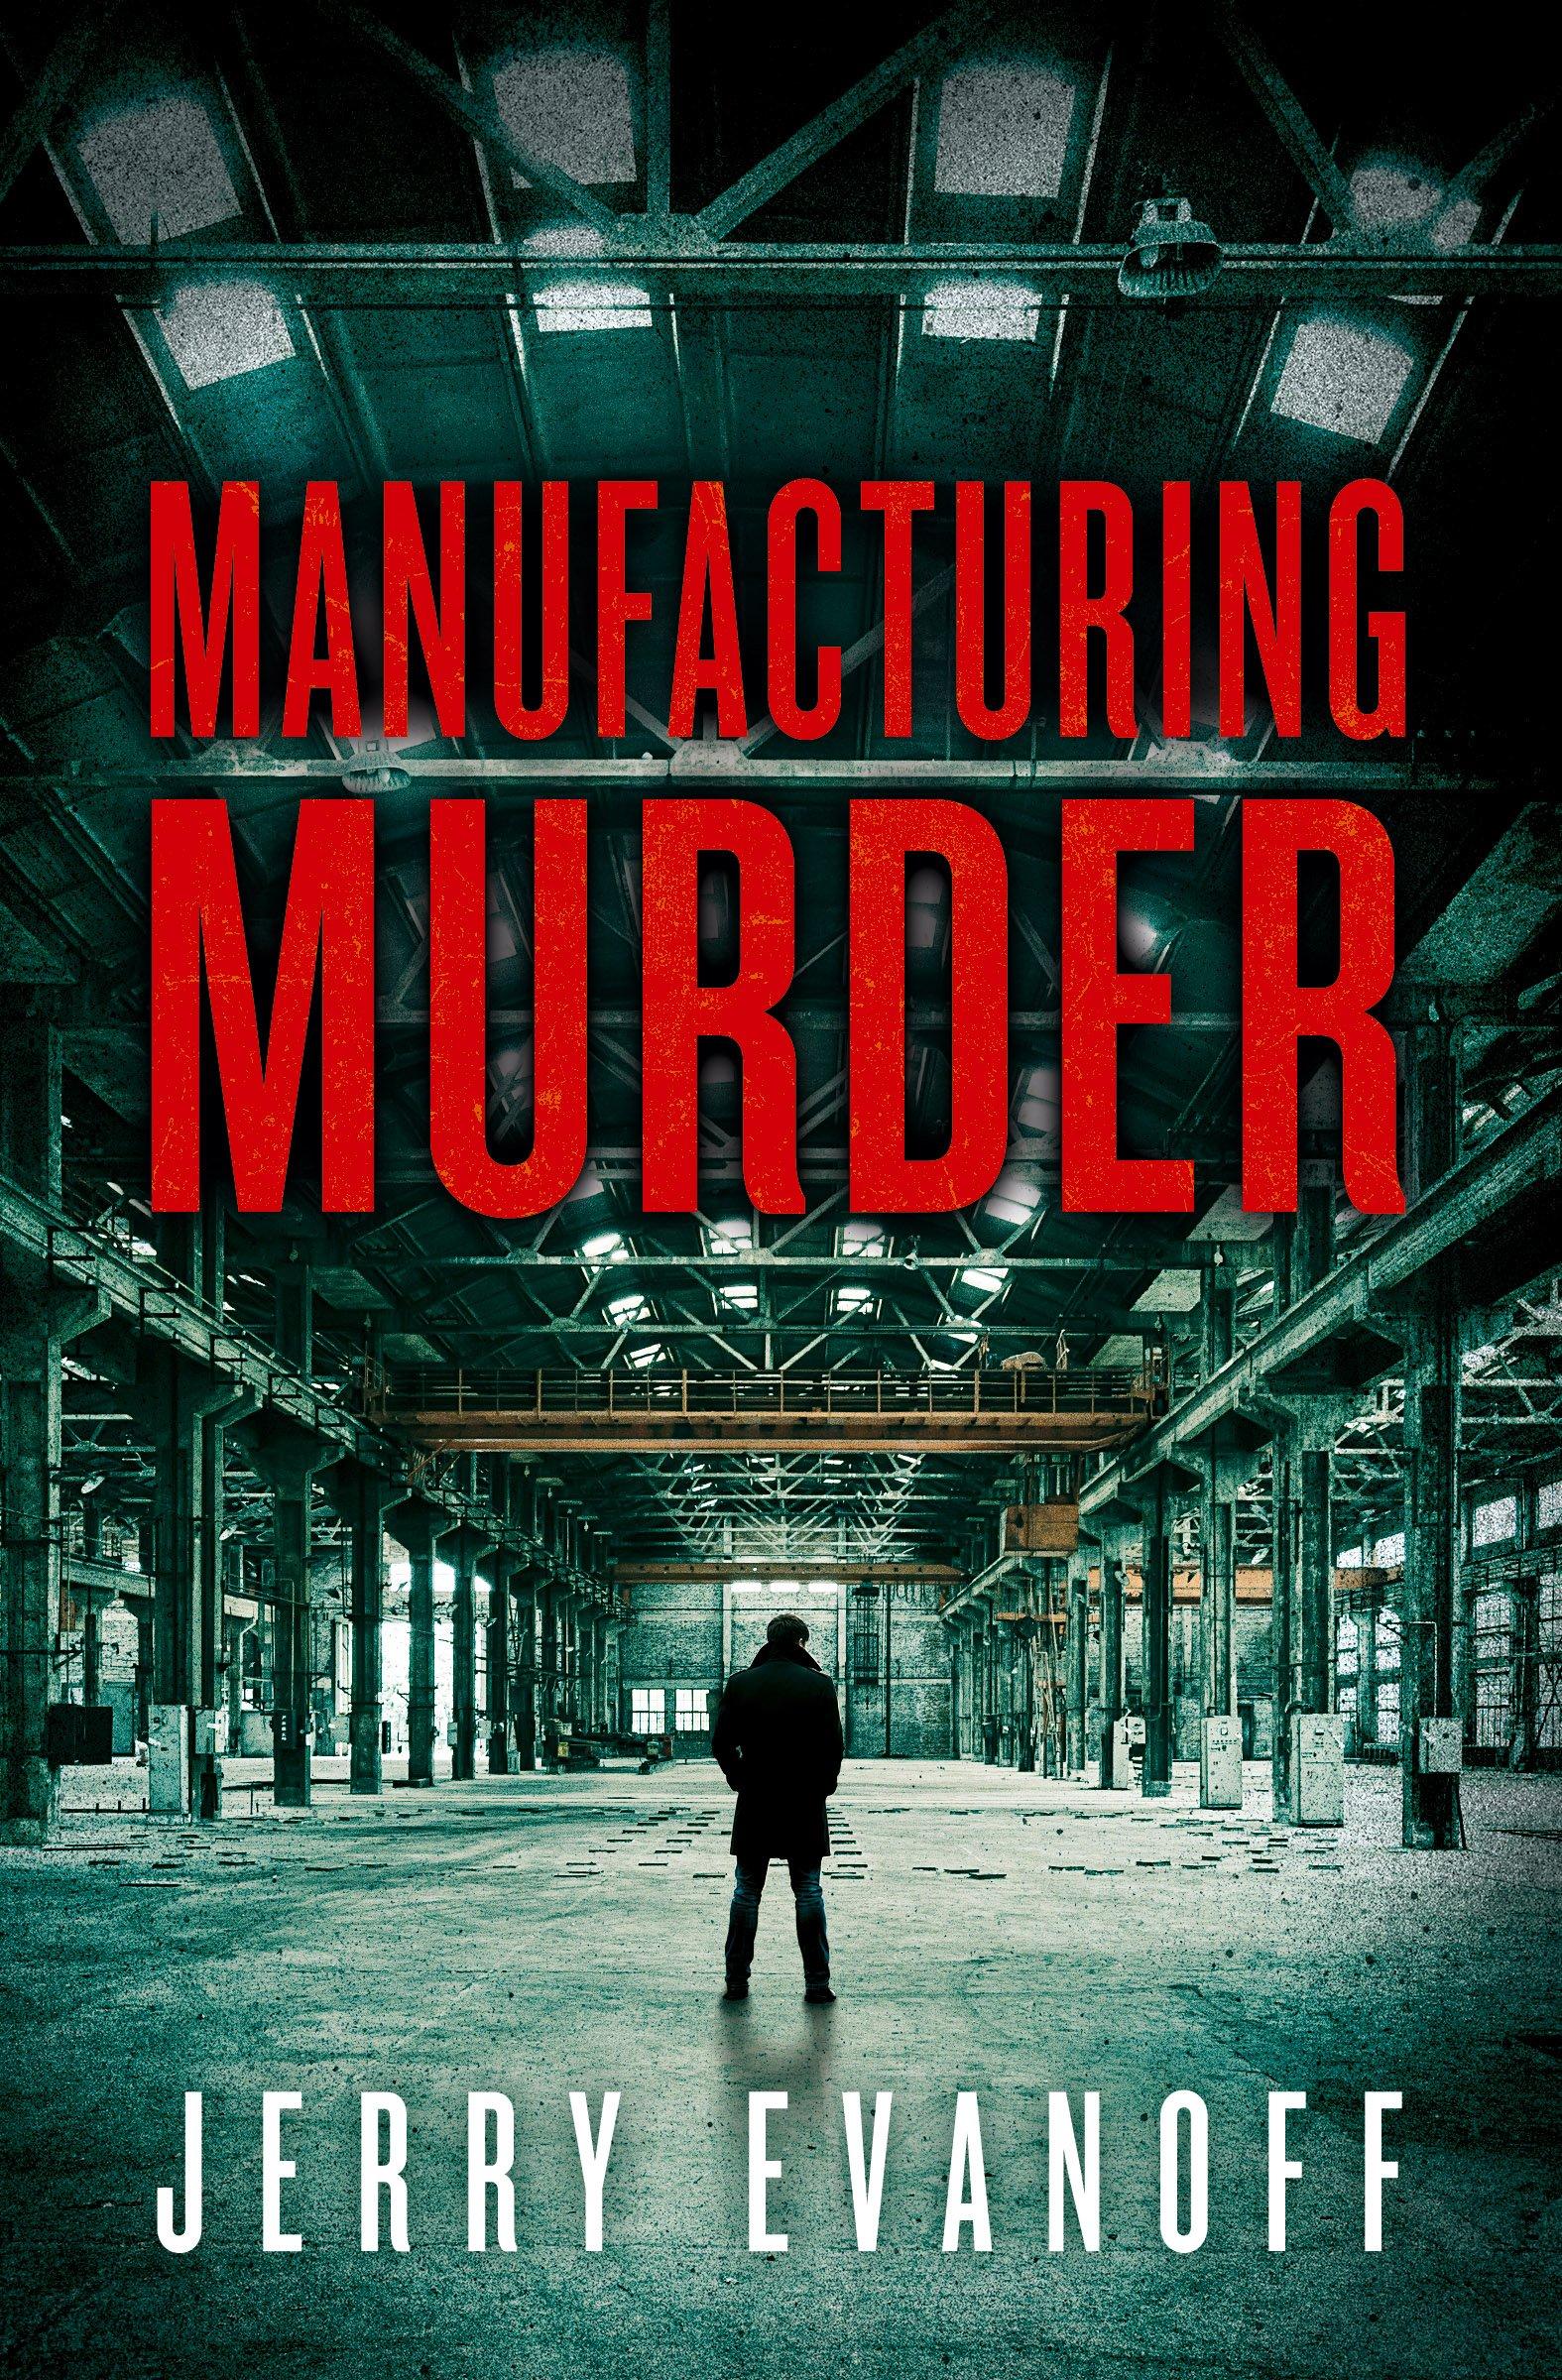 Manufacturing Murder